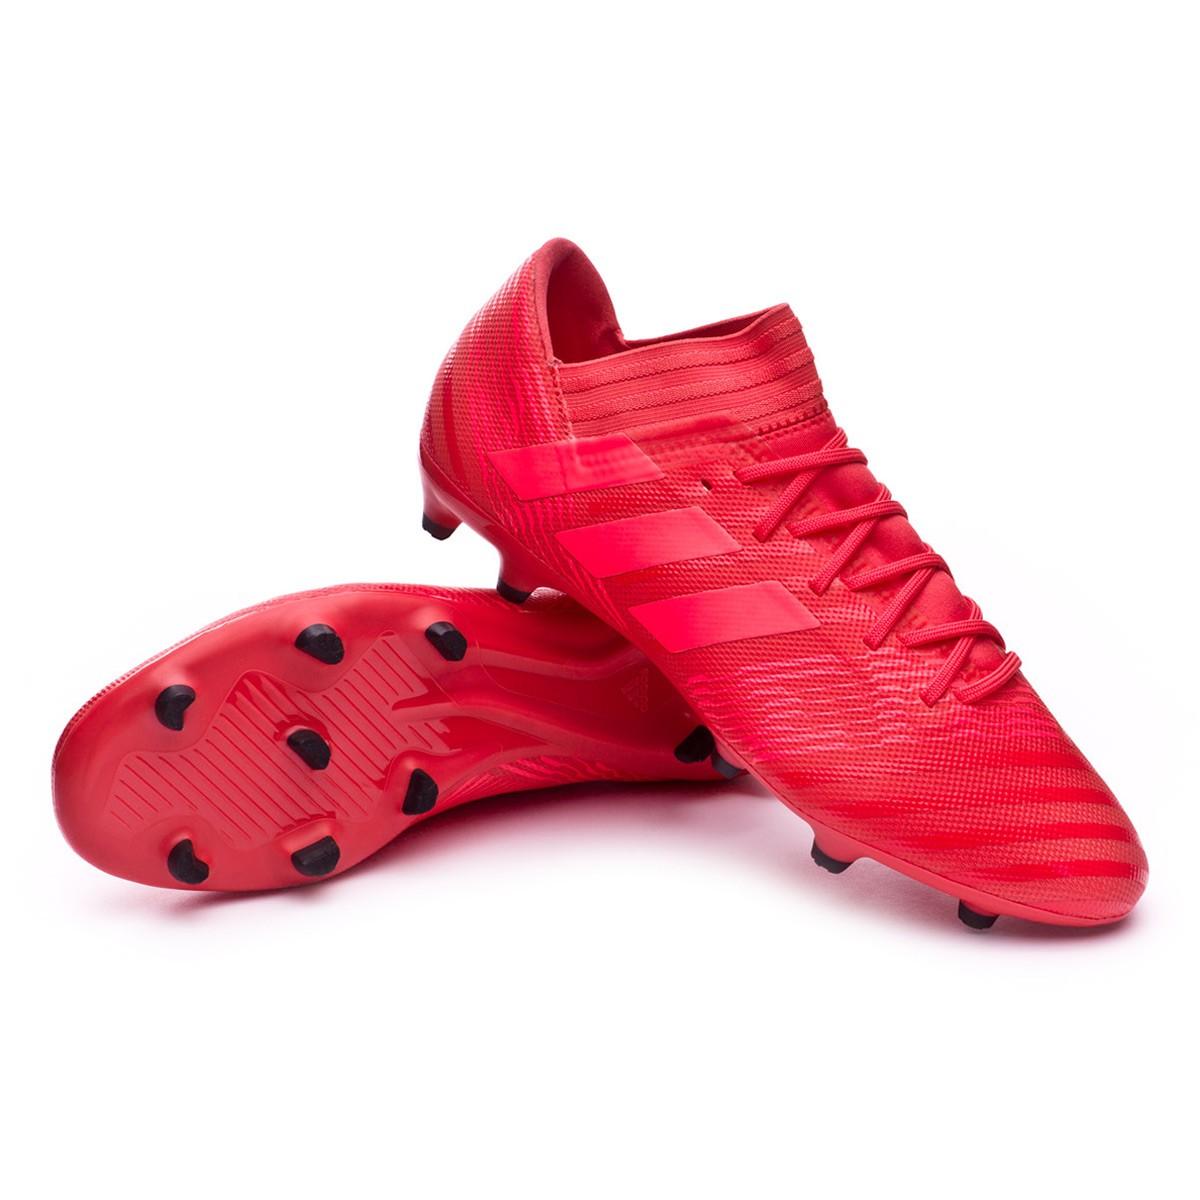 ca851d646b88 Football Boots adidas Nemeziz 17.3 FG Real coral-Red zest-Real black ...